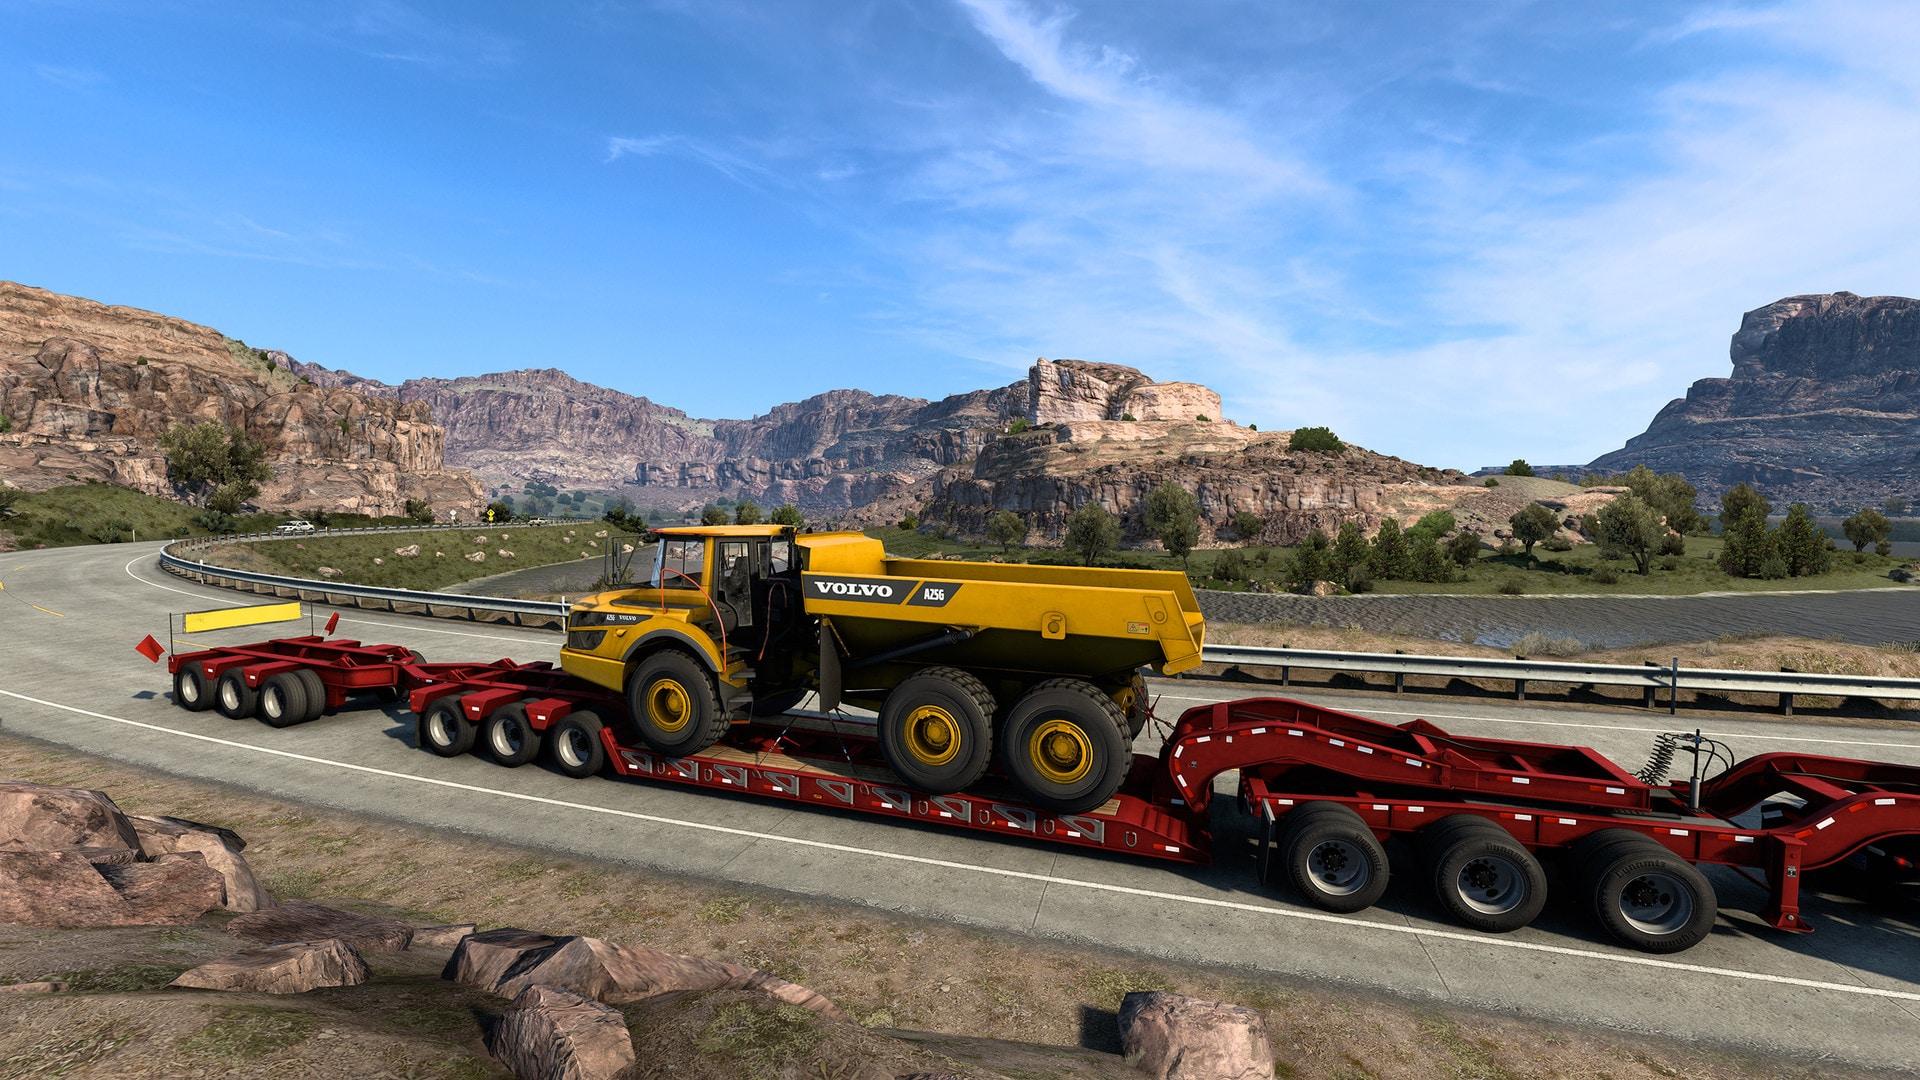 American Truck Simulator - Volvo Construction Equipment (PC) - Steam Gift - GLOBAL - 3